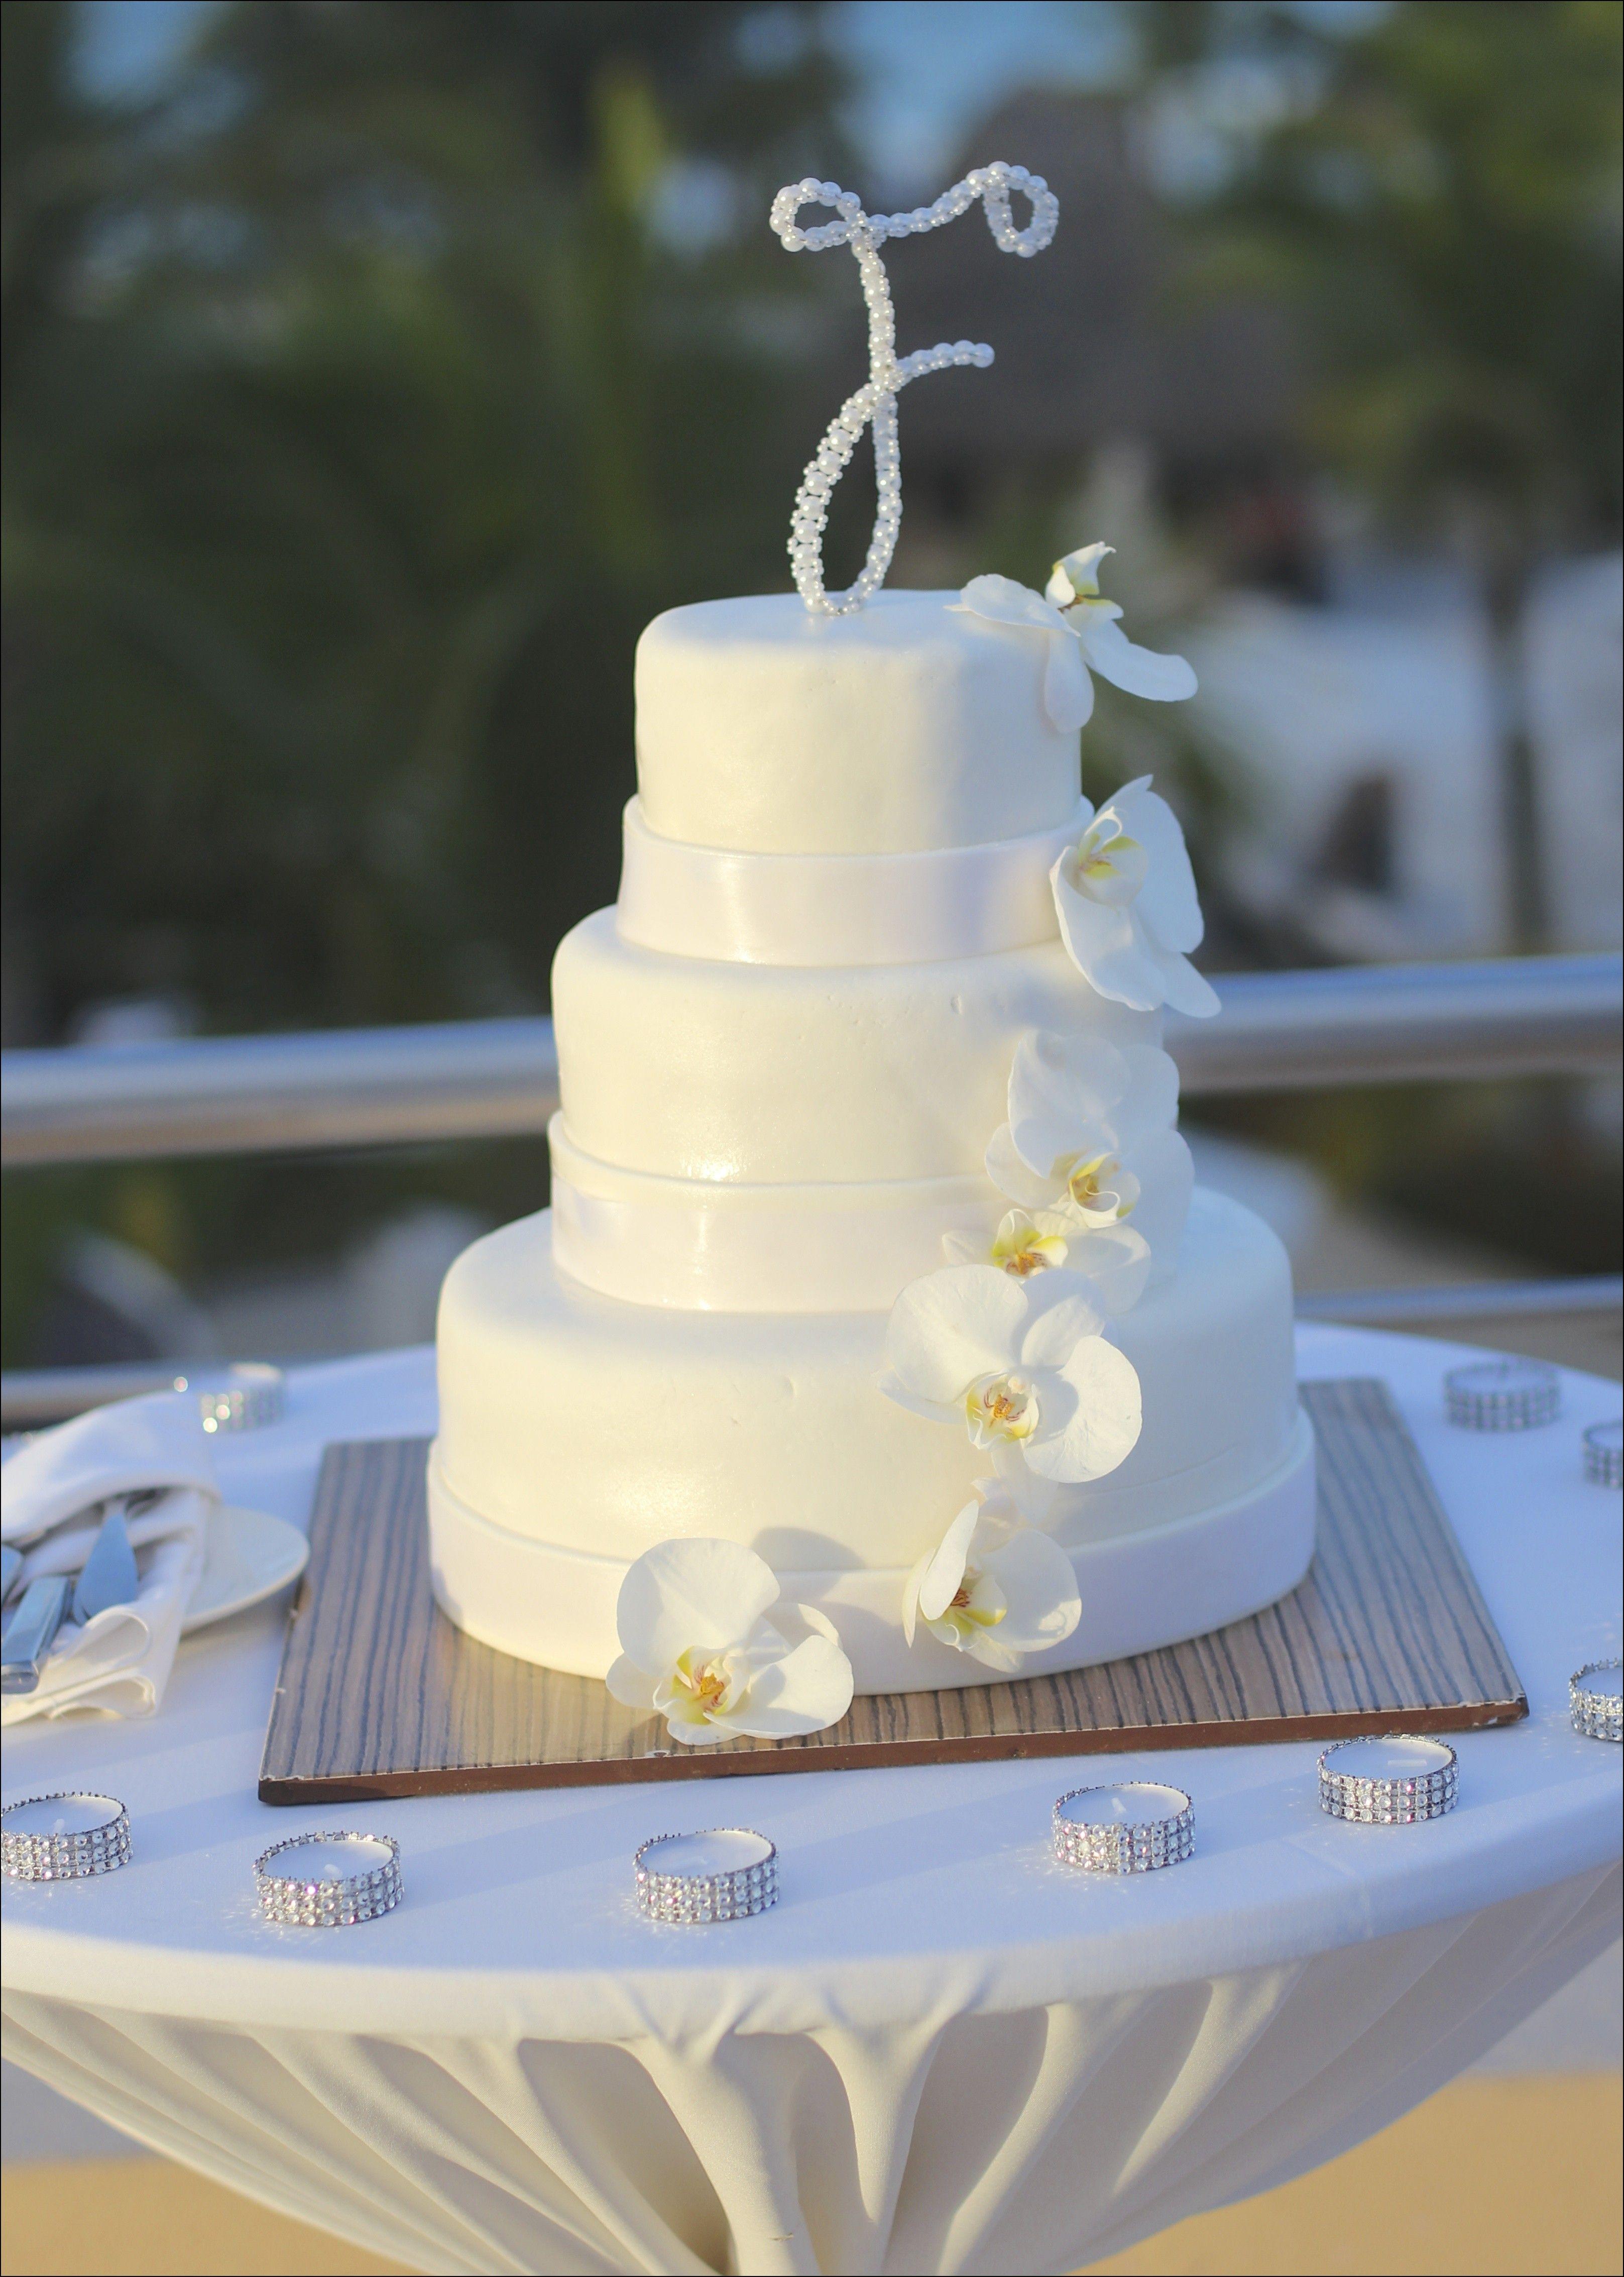 Dominican Wedding Cakes - Complimentary 3-tier wedding ...